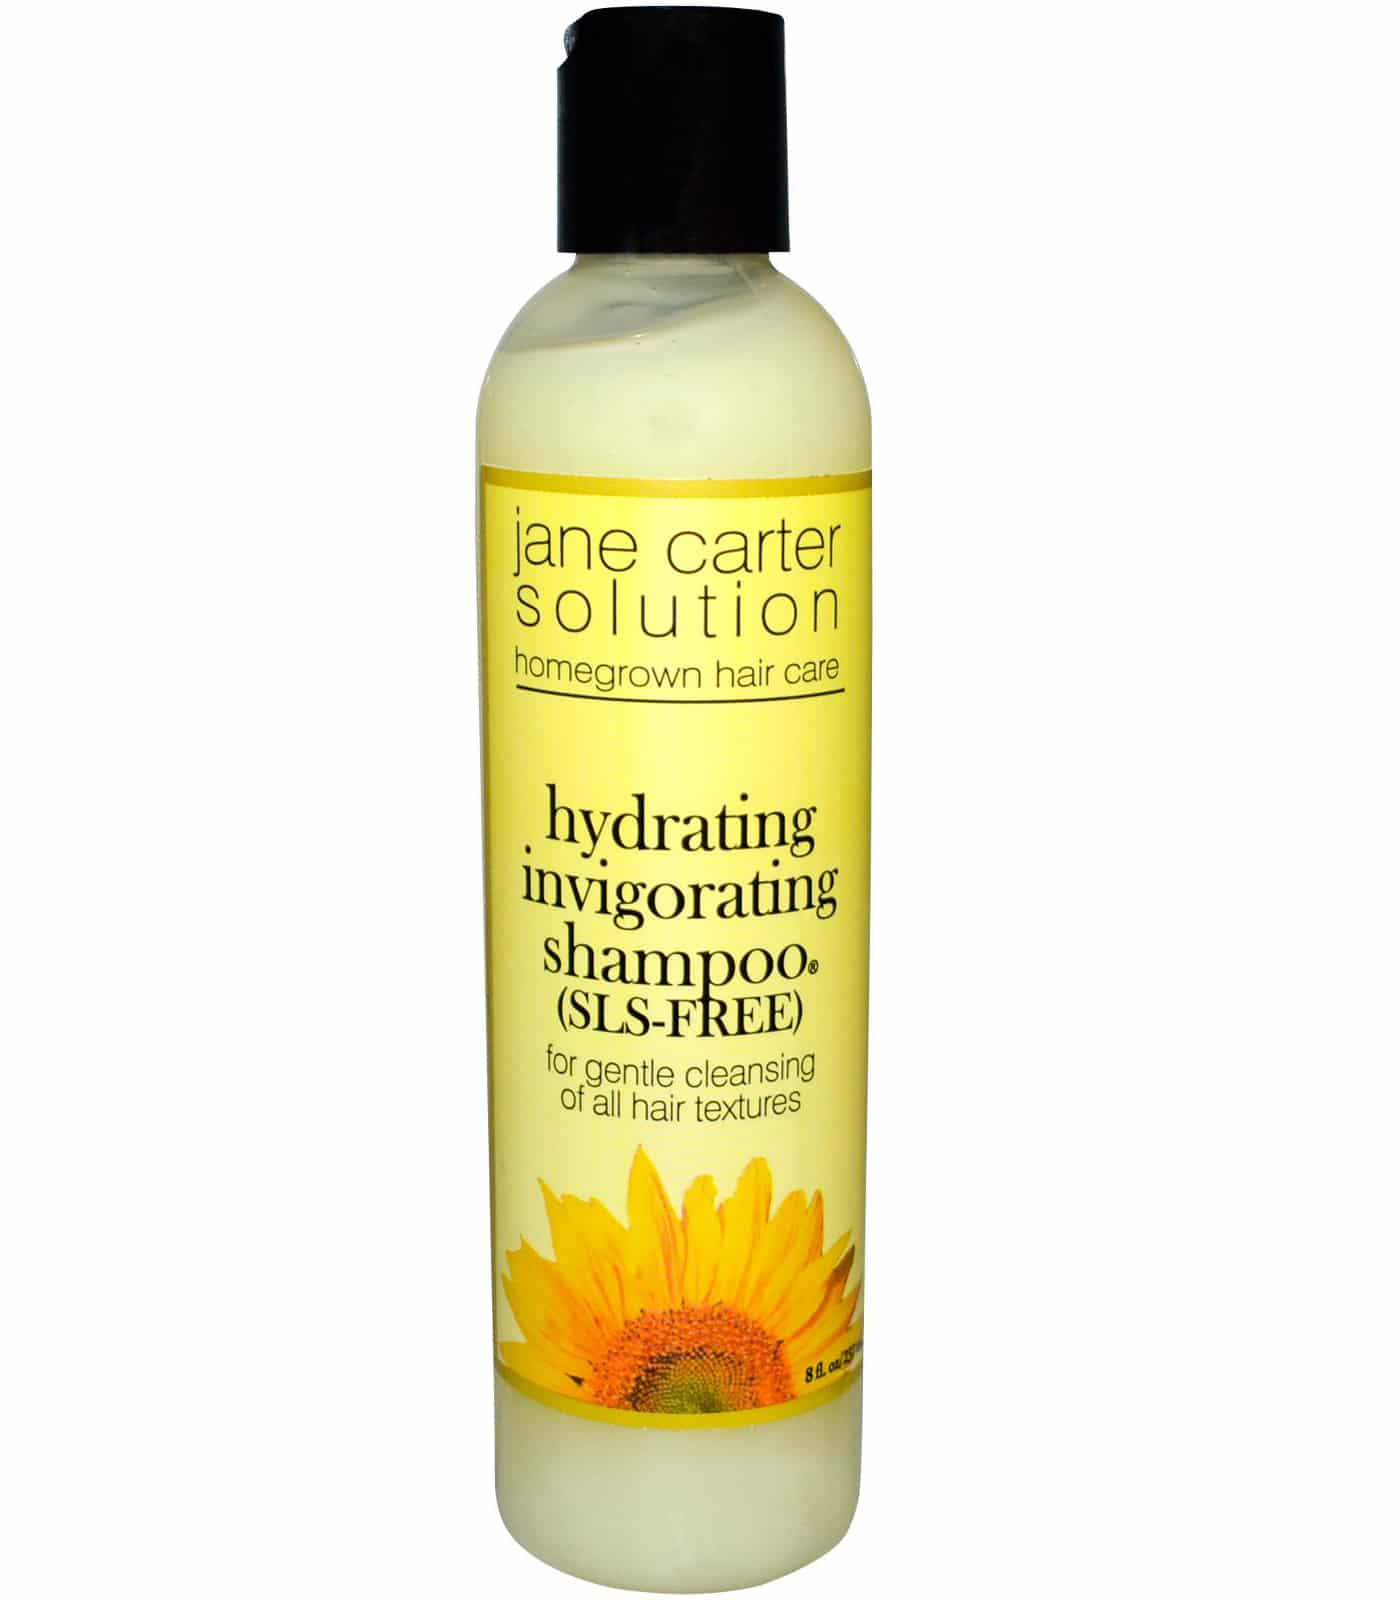 Jane Carter Hydrating Invigorating Shampoo Sls Free 8oz